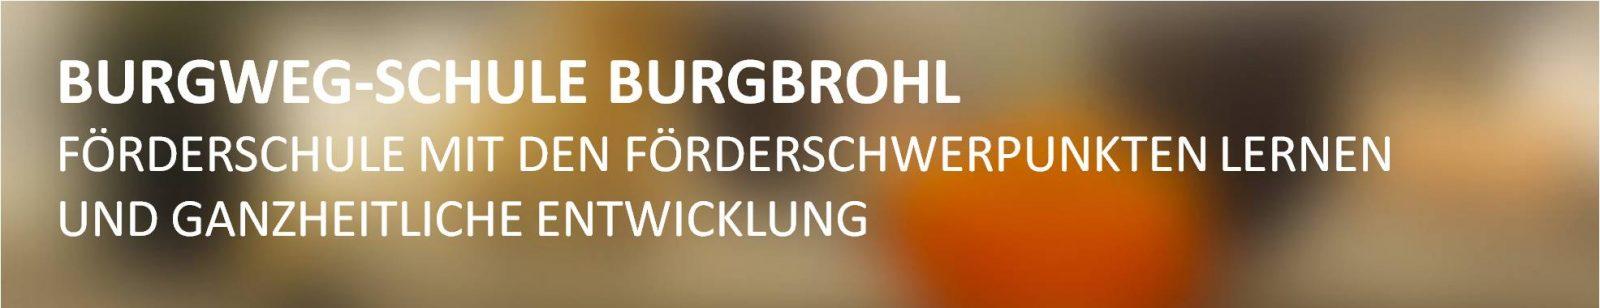 Burgweg-Schule Burgbrohl